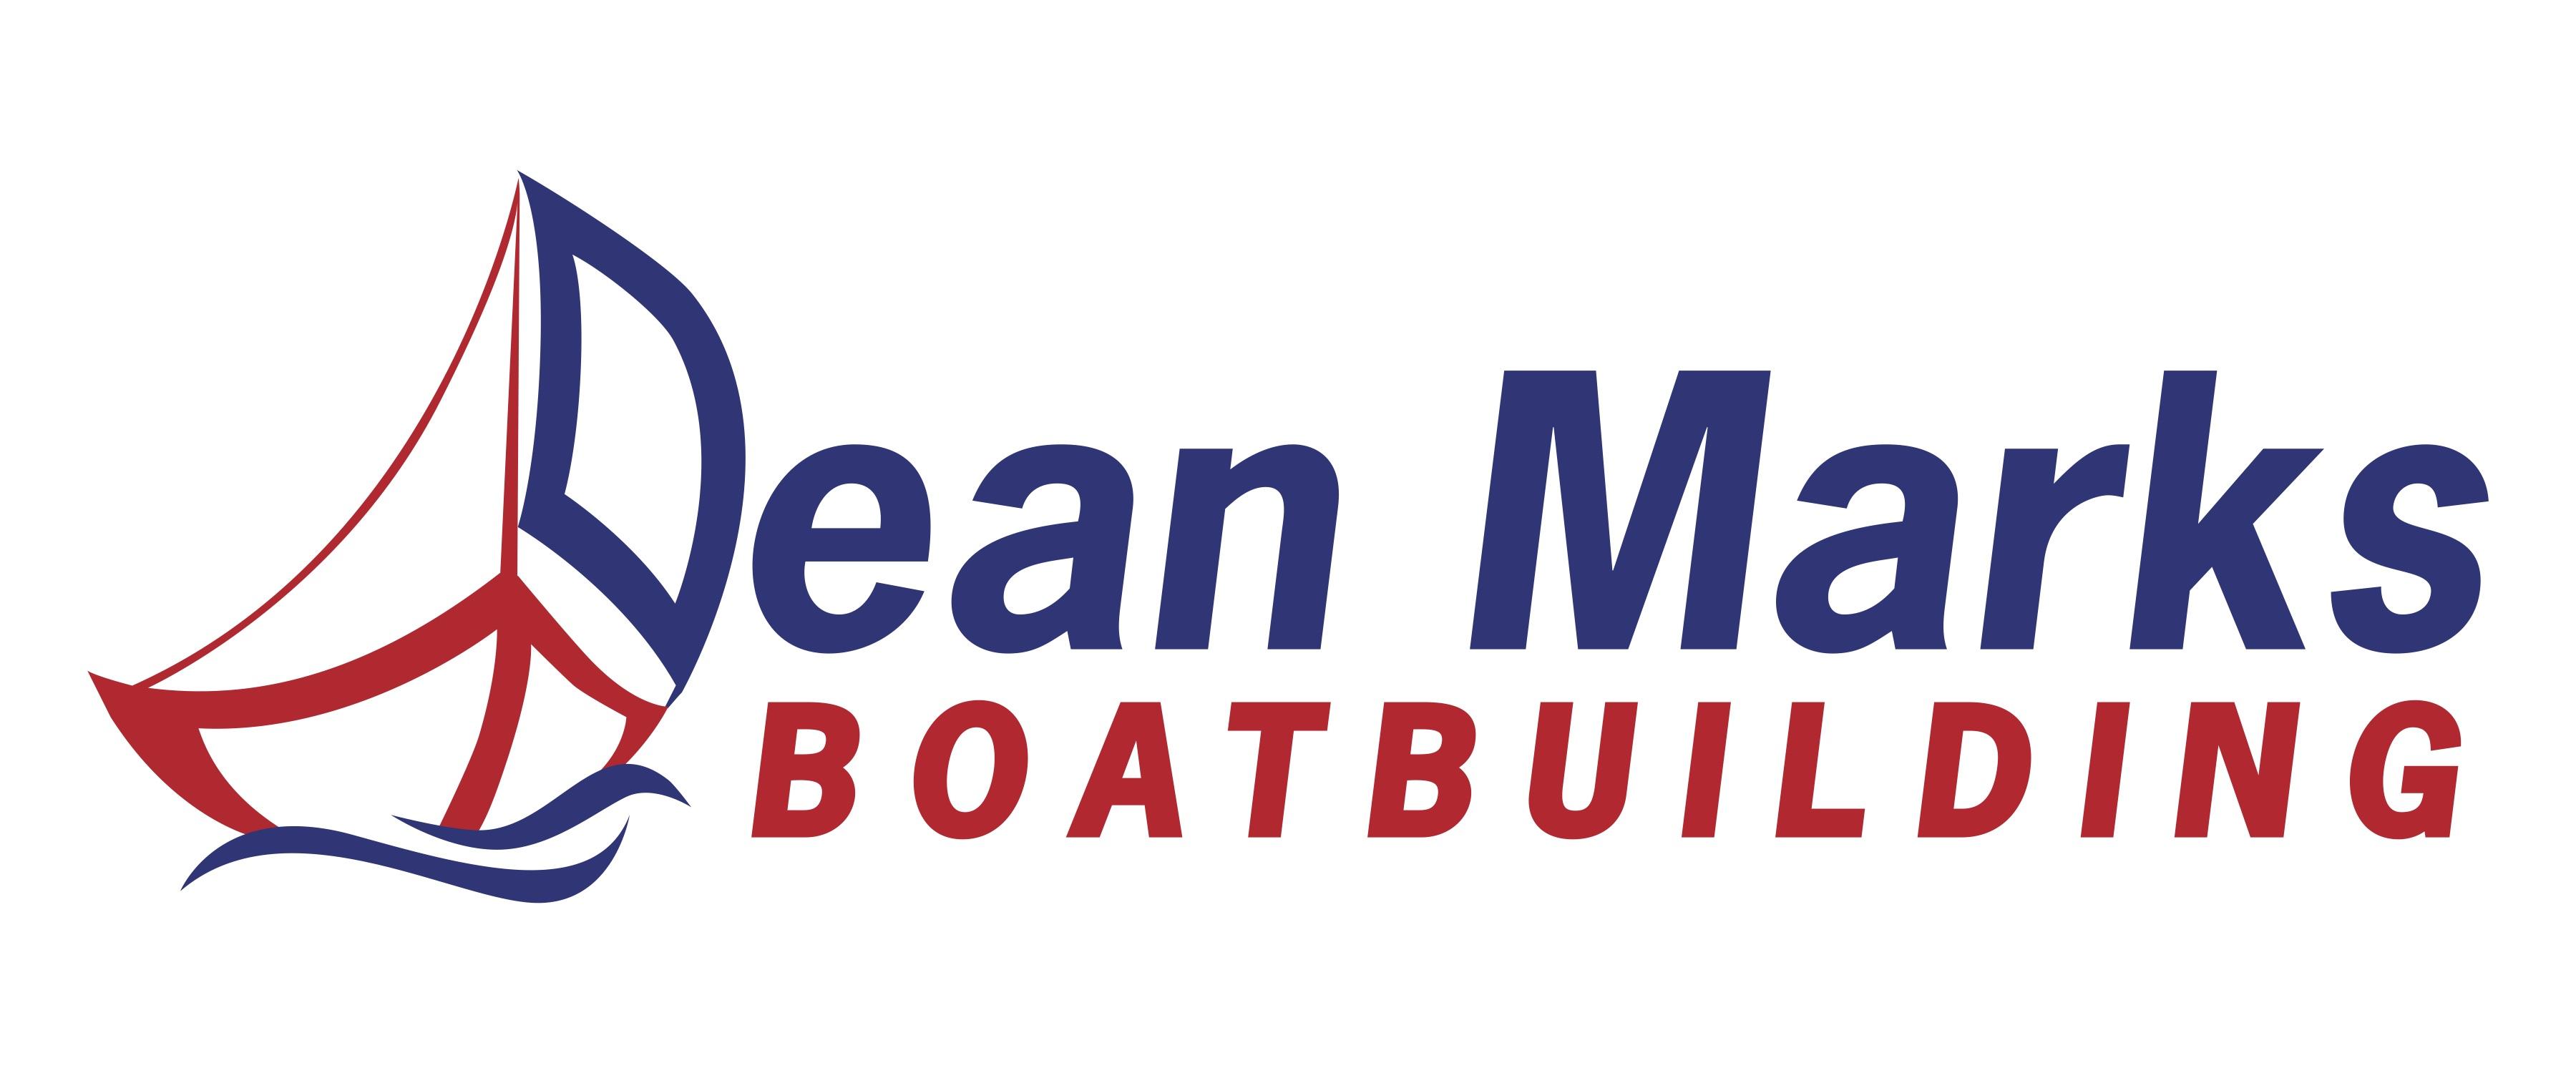 Dean Marks Boatbuilding Logo